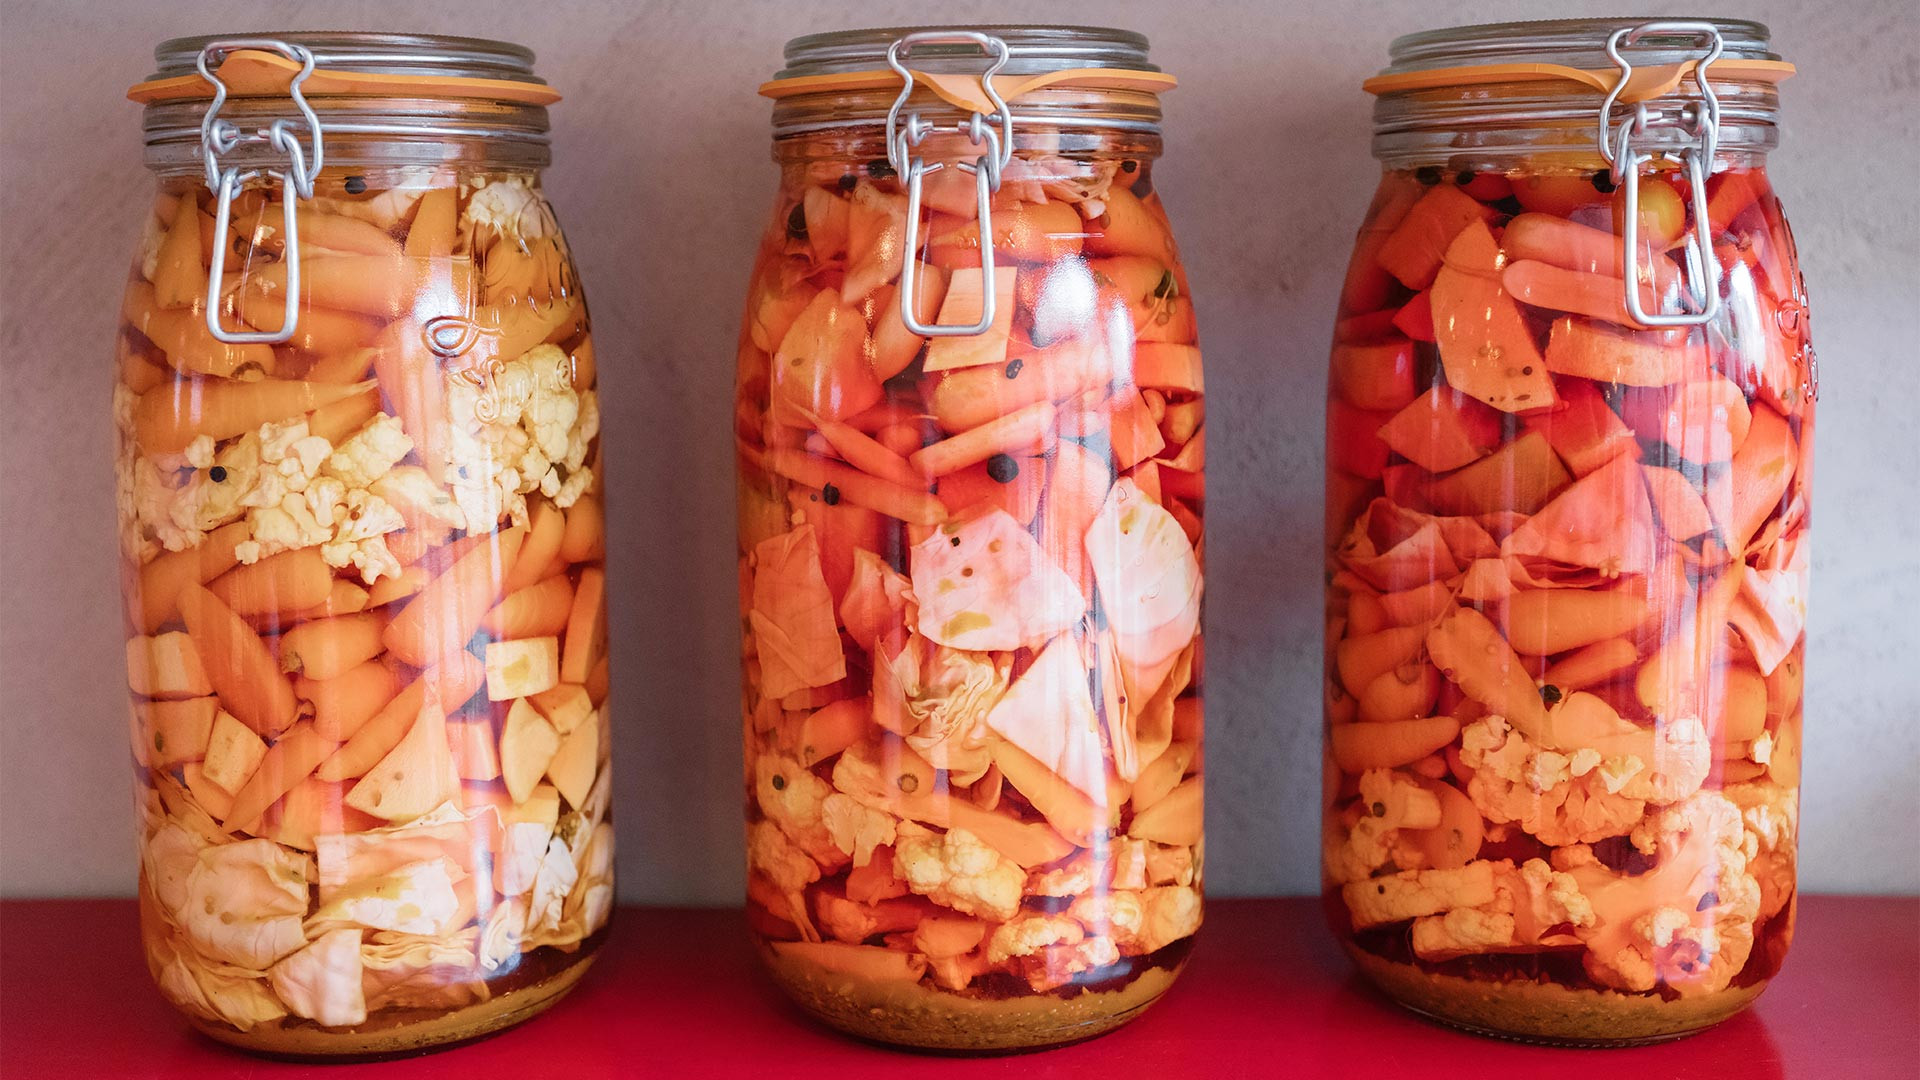 Spicy house-made pickles at Villa Mama's